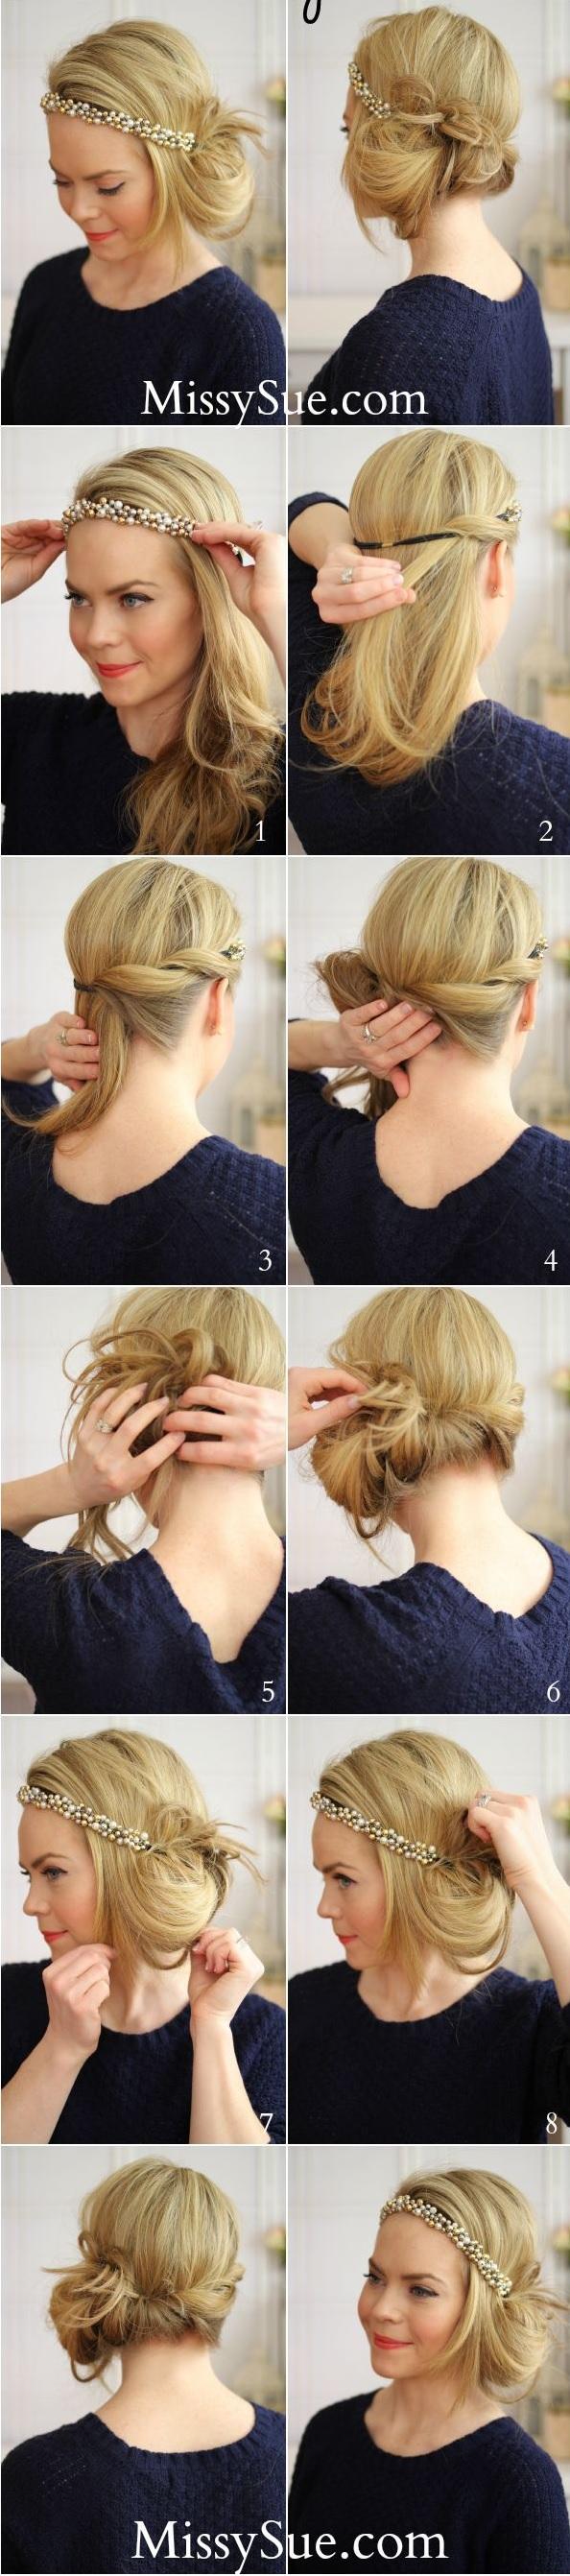 coiffure-soirée-3